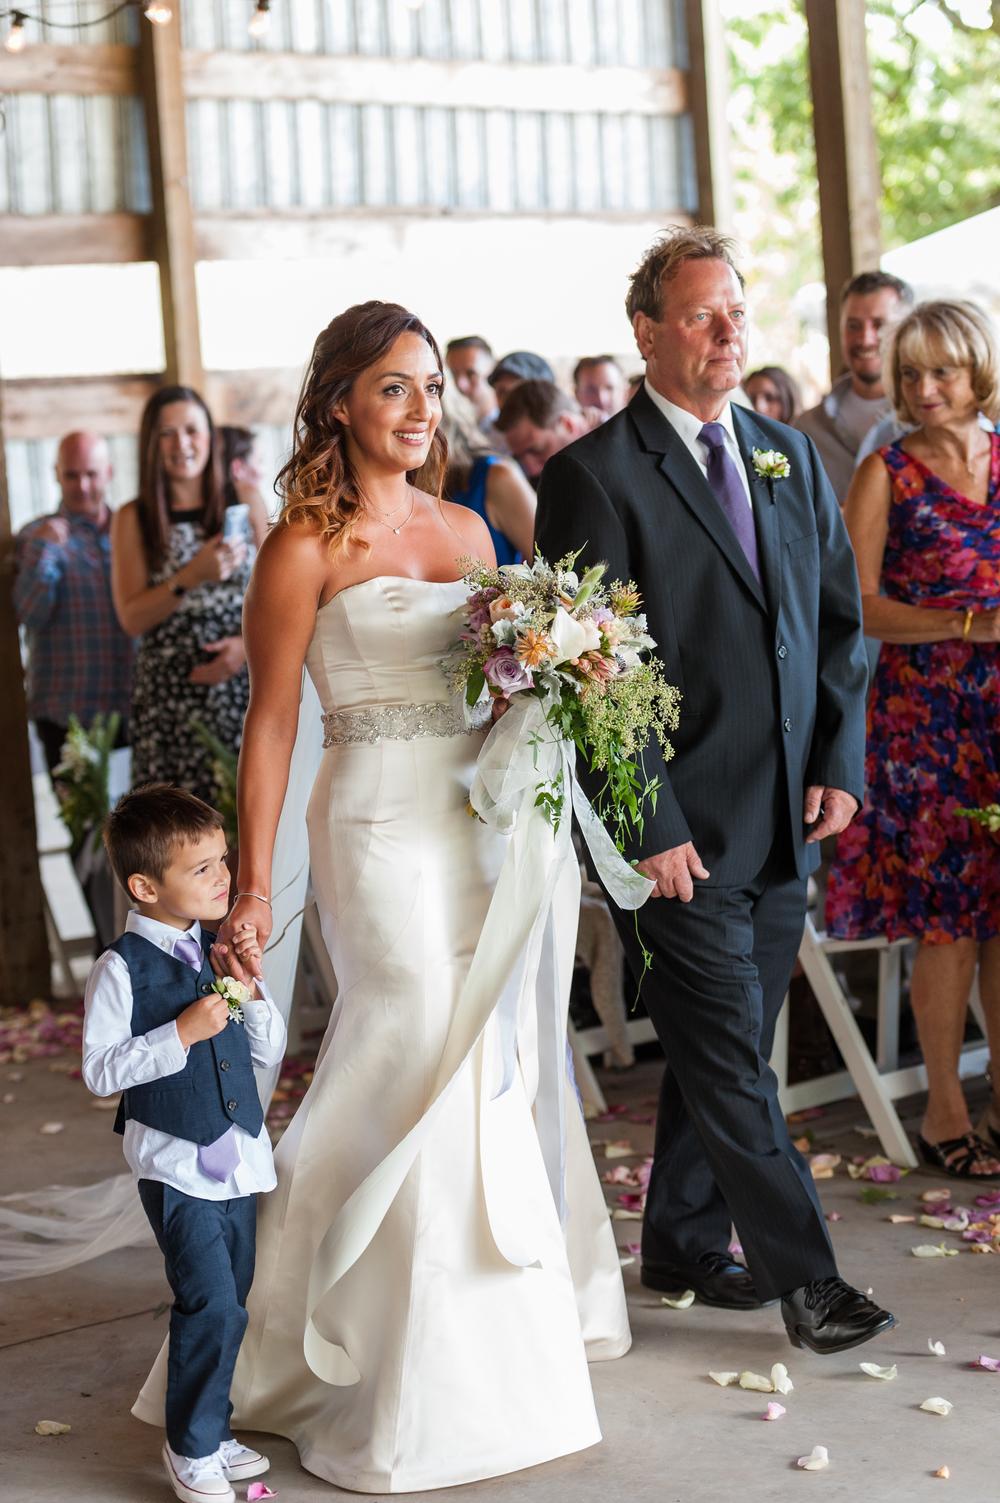 Bridalbliss.com | Portland Wedding | Oregon Event Planning and Design | Powers Studios